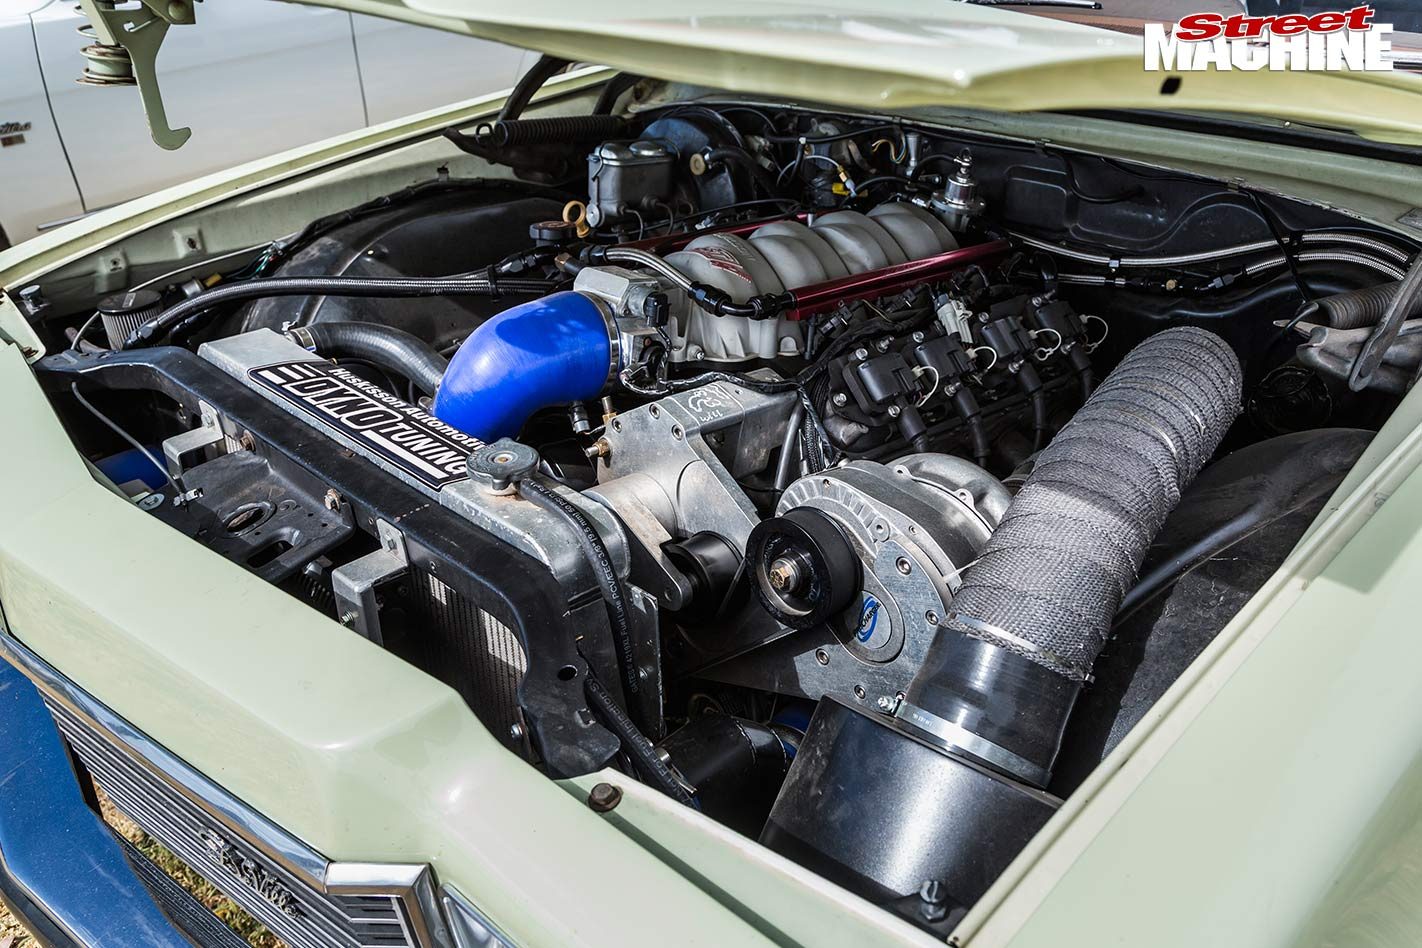 Holden HX wagon engine bay